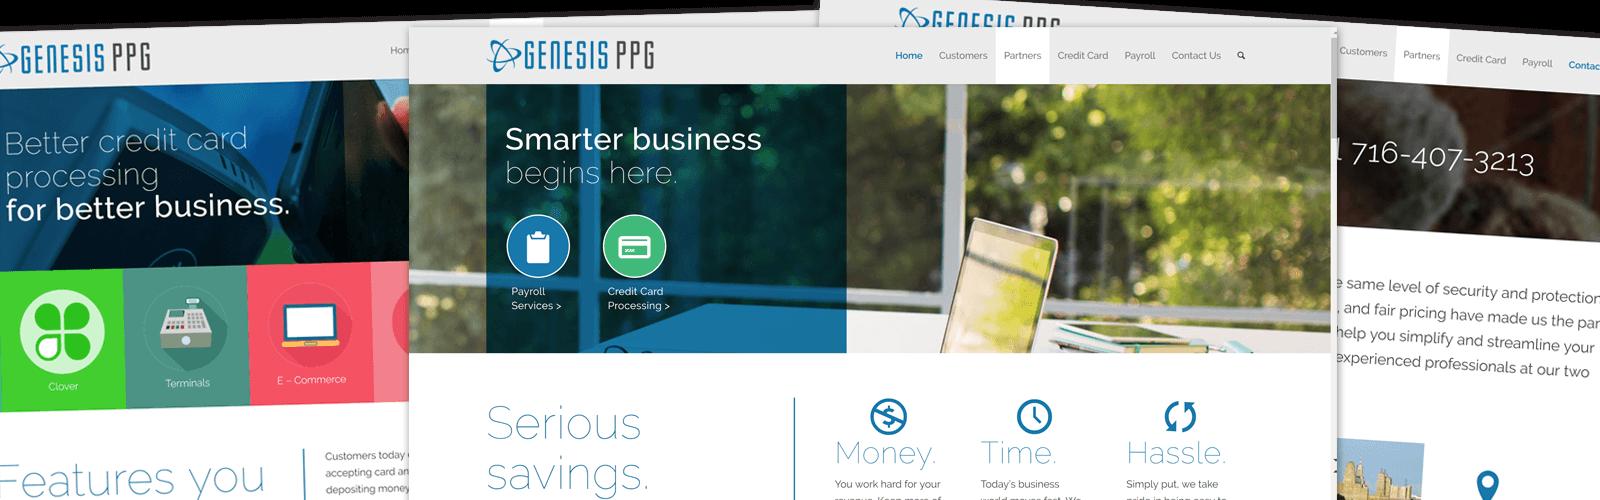 Genesis PPG - Website Development